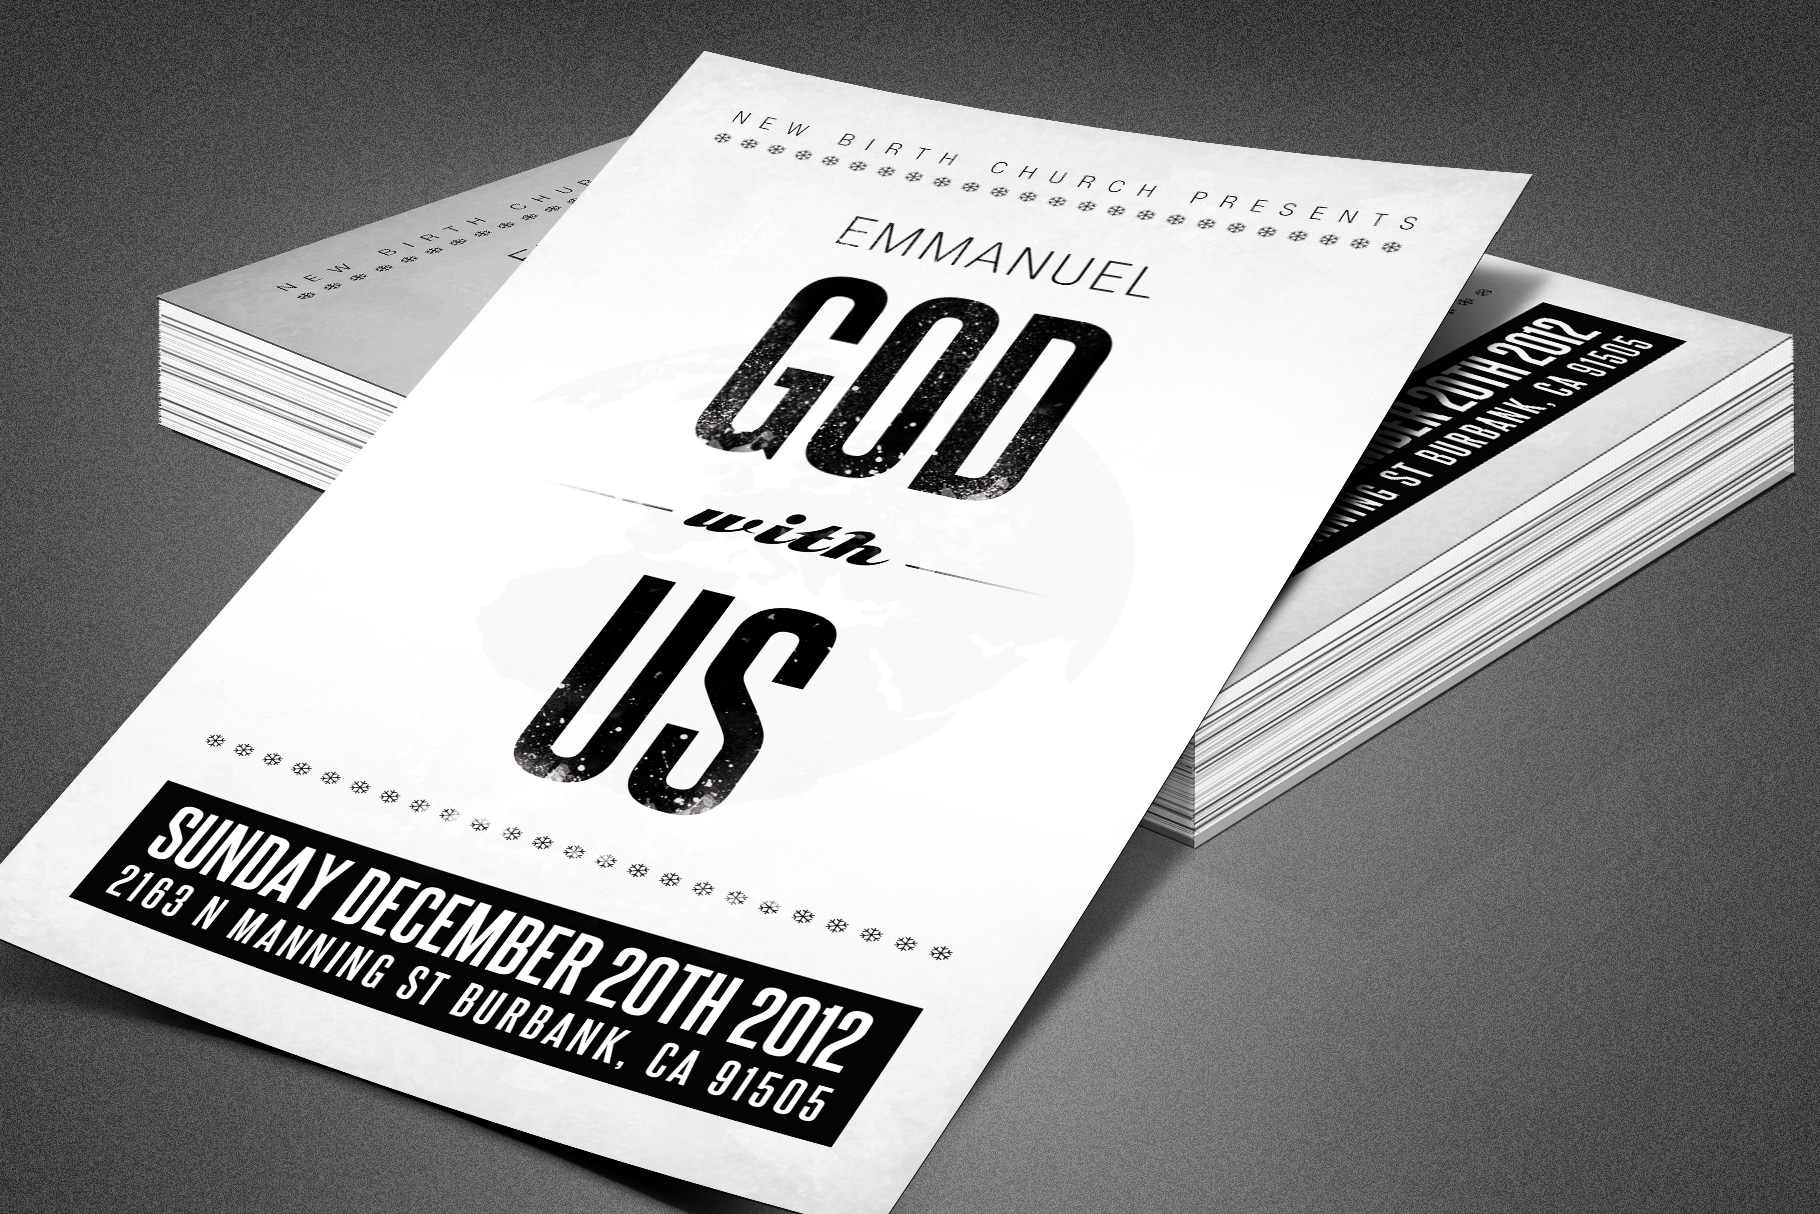 Emmanuel Christmas Church Flyer example image 2